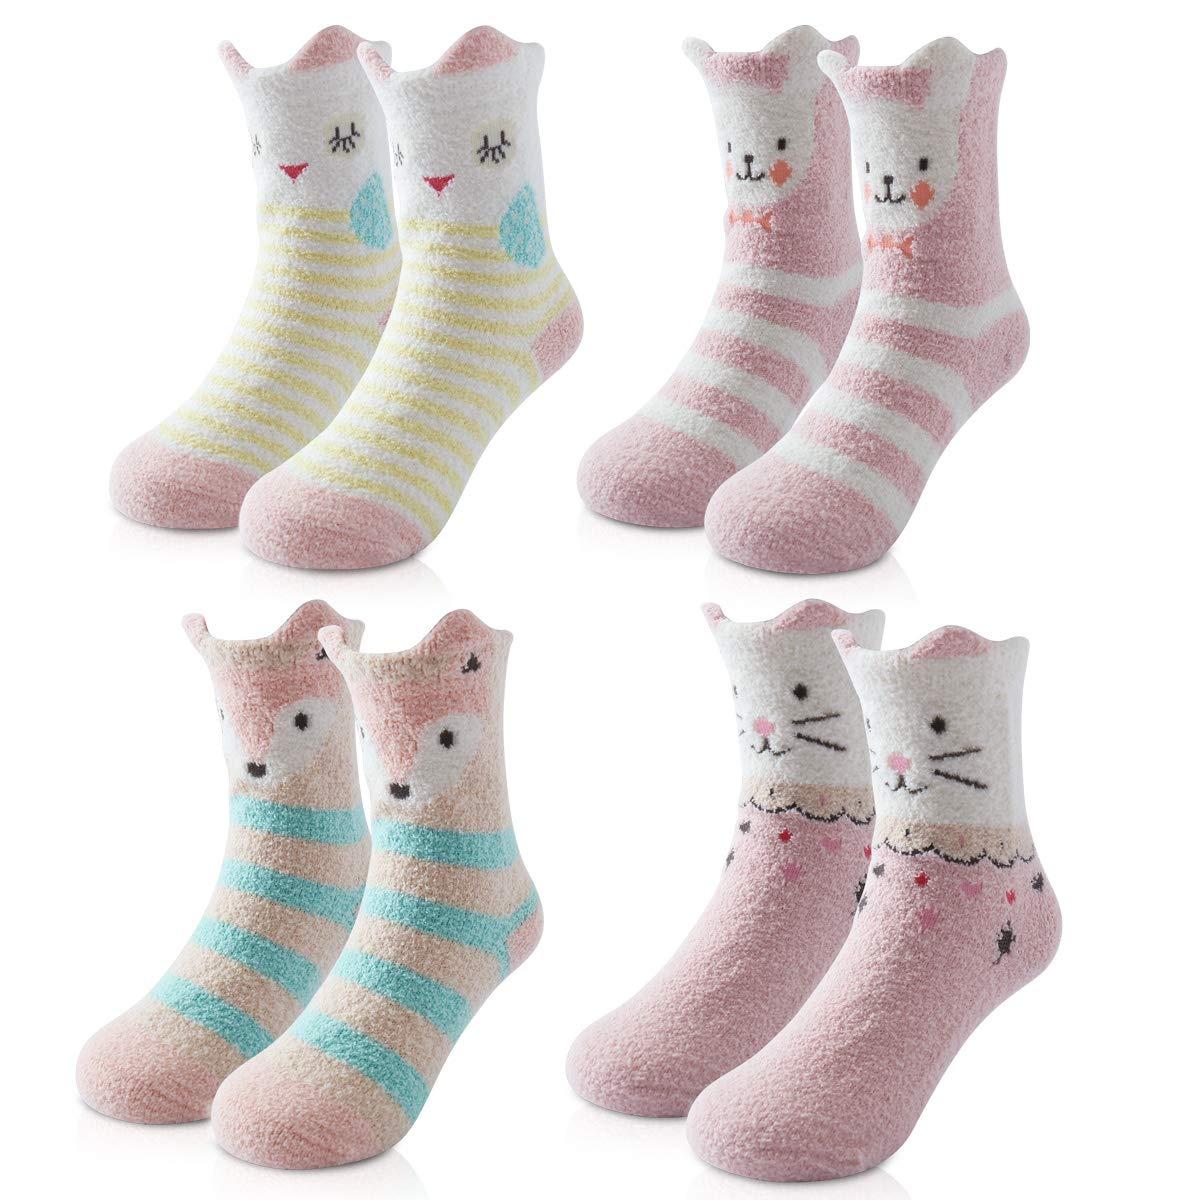 Beauttable Cute Girls Boys Cozy Fuzzy Socks,Fluffy Crew Socks,Soft Warm Winter Kids Sox